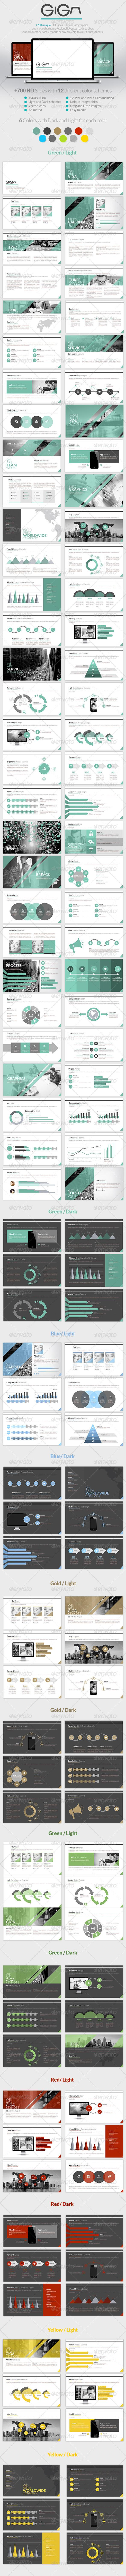 GraphicRiver Giga Powerpoint Presentation 8535722